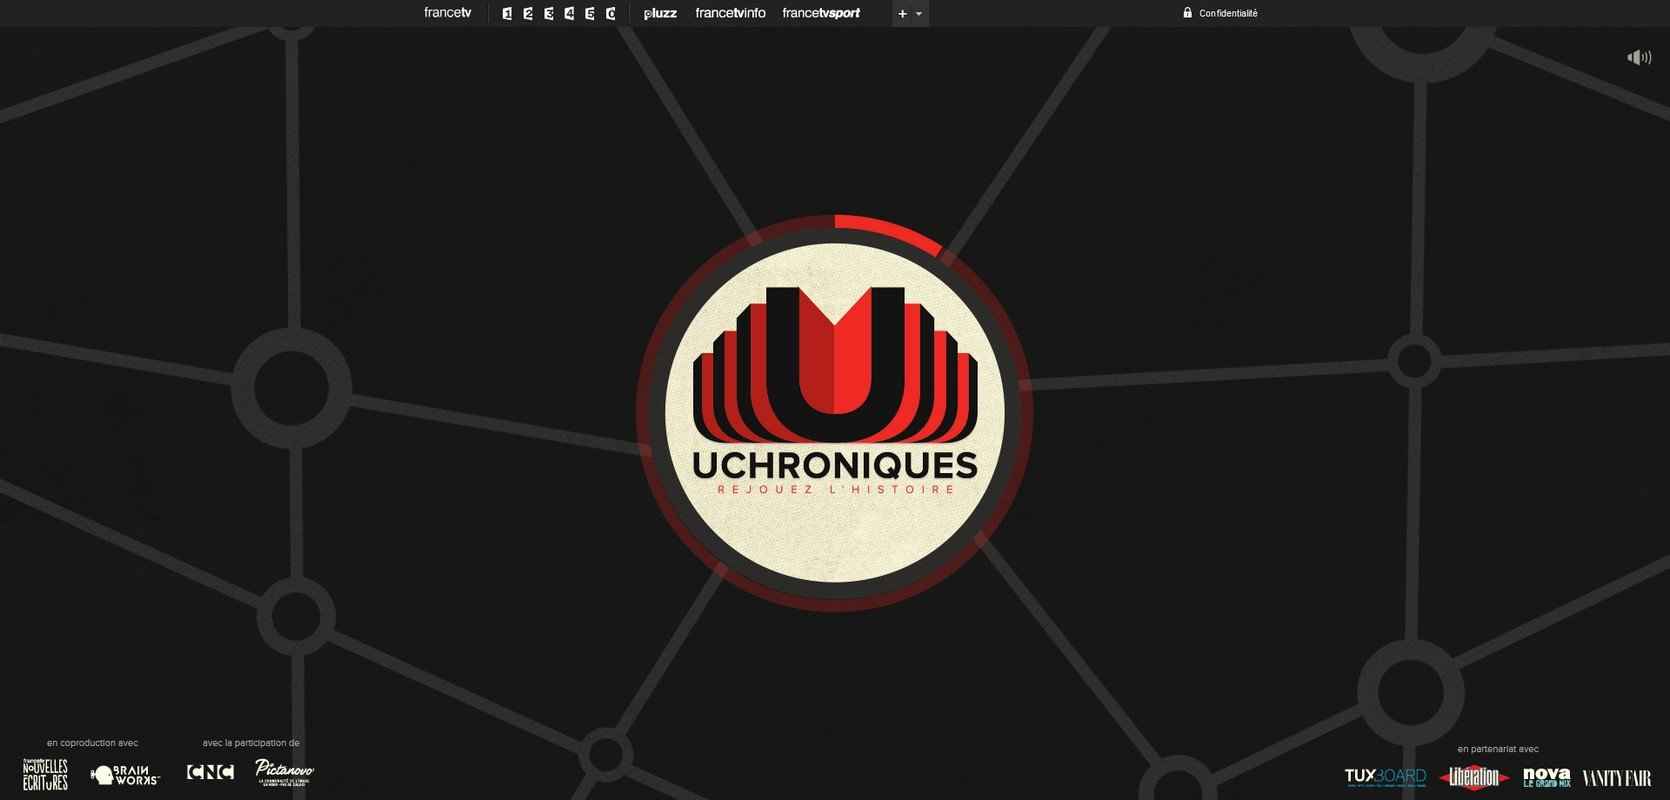 Accueil du site UCHRONIQUES